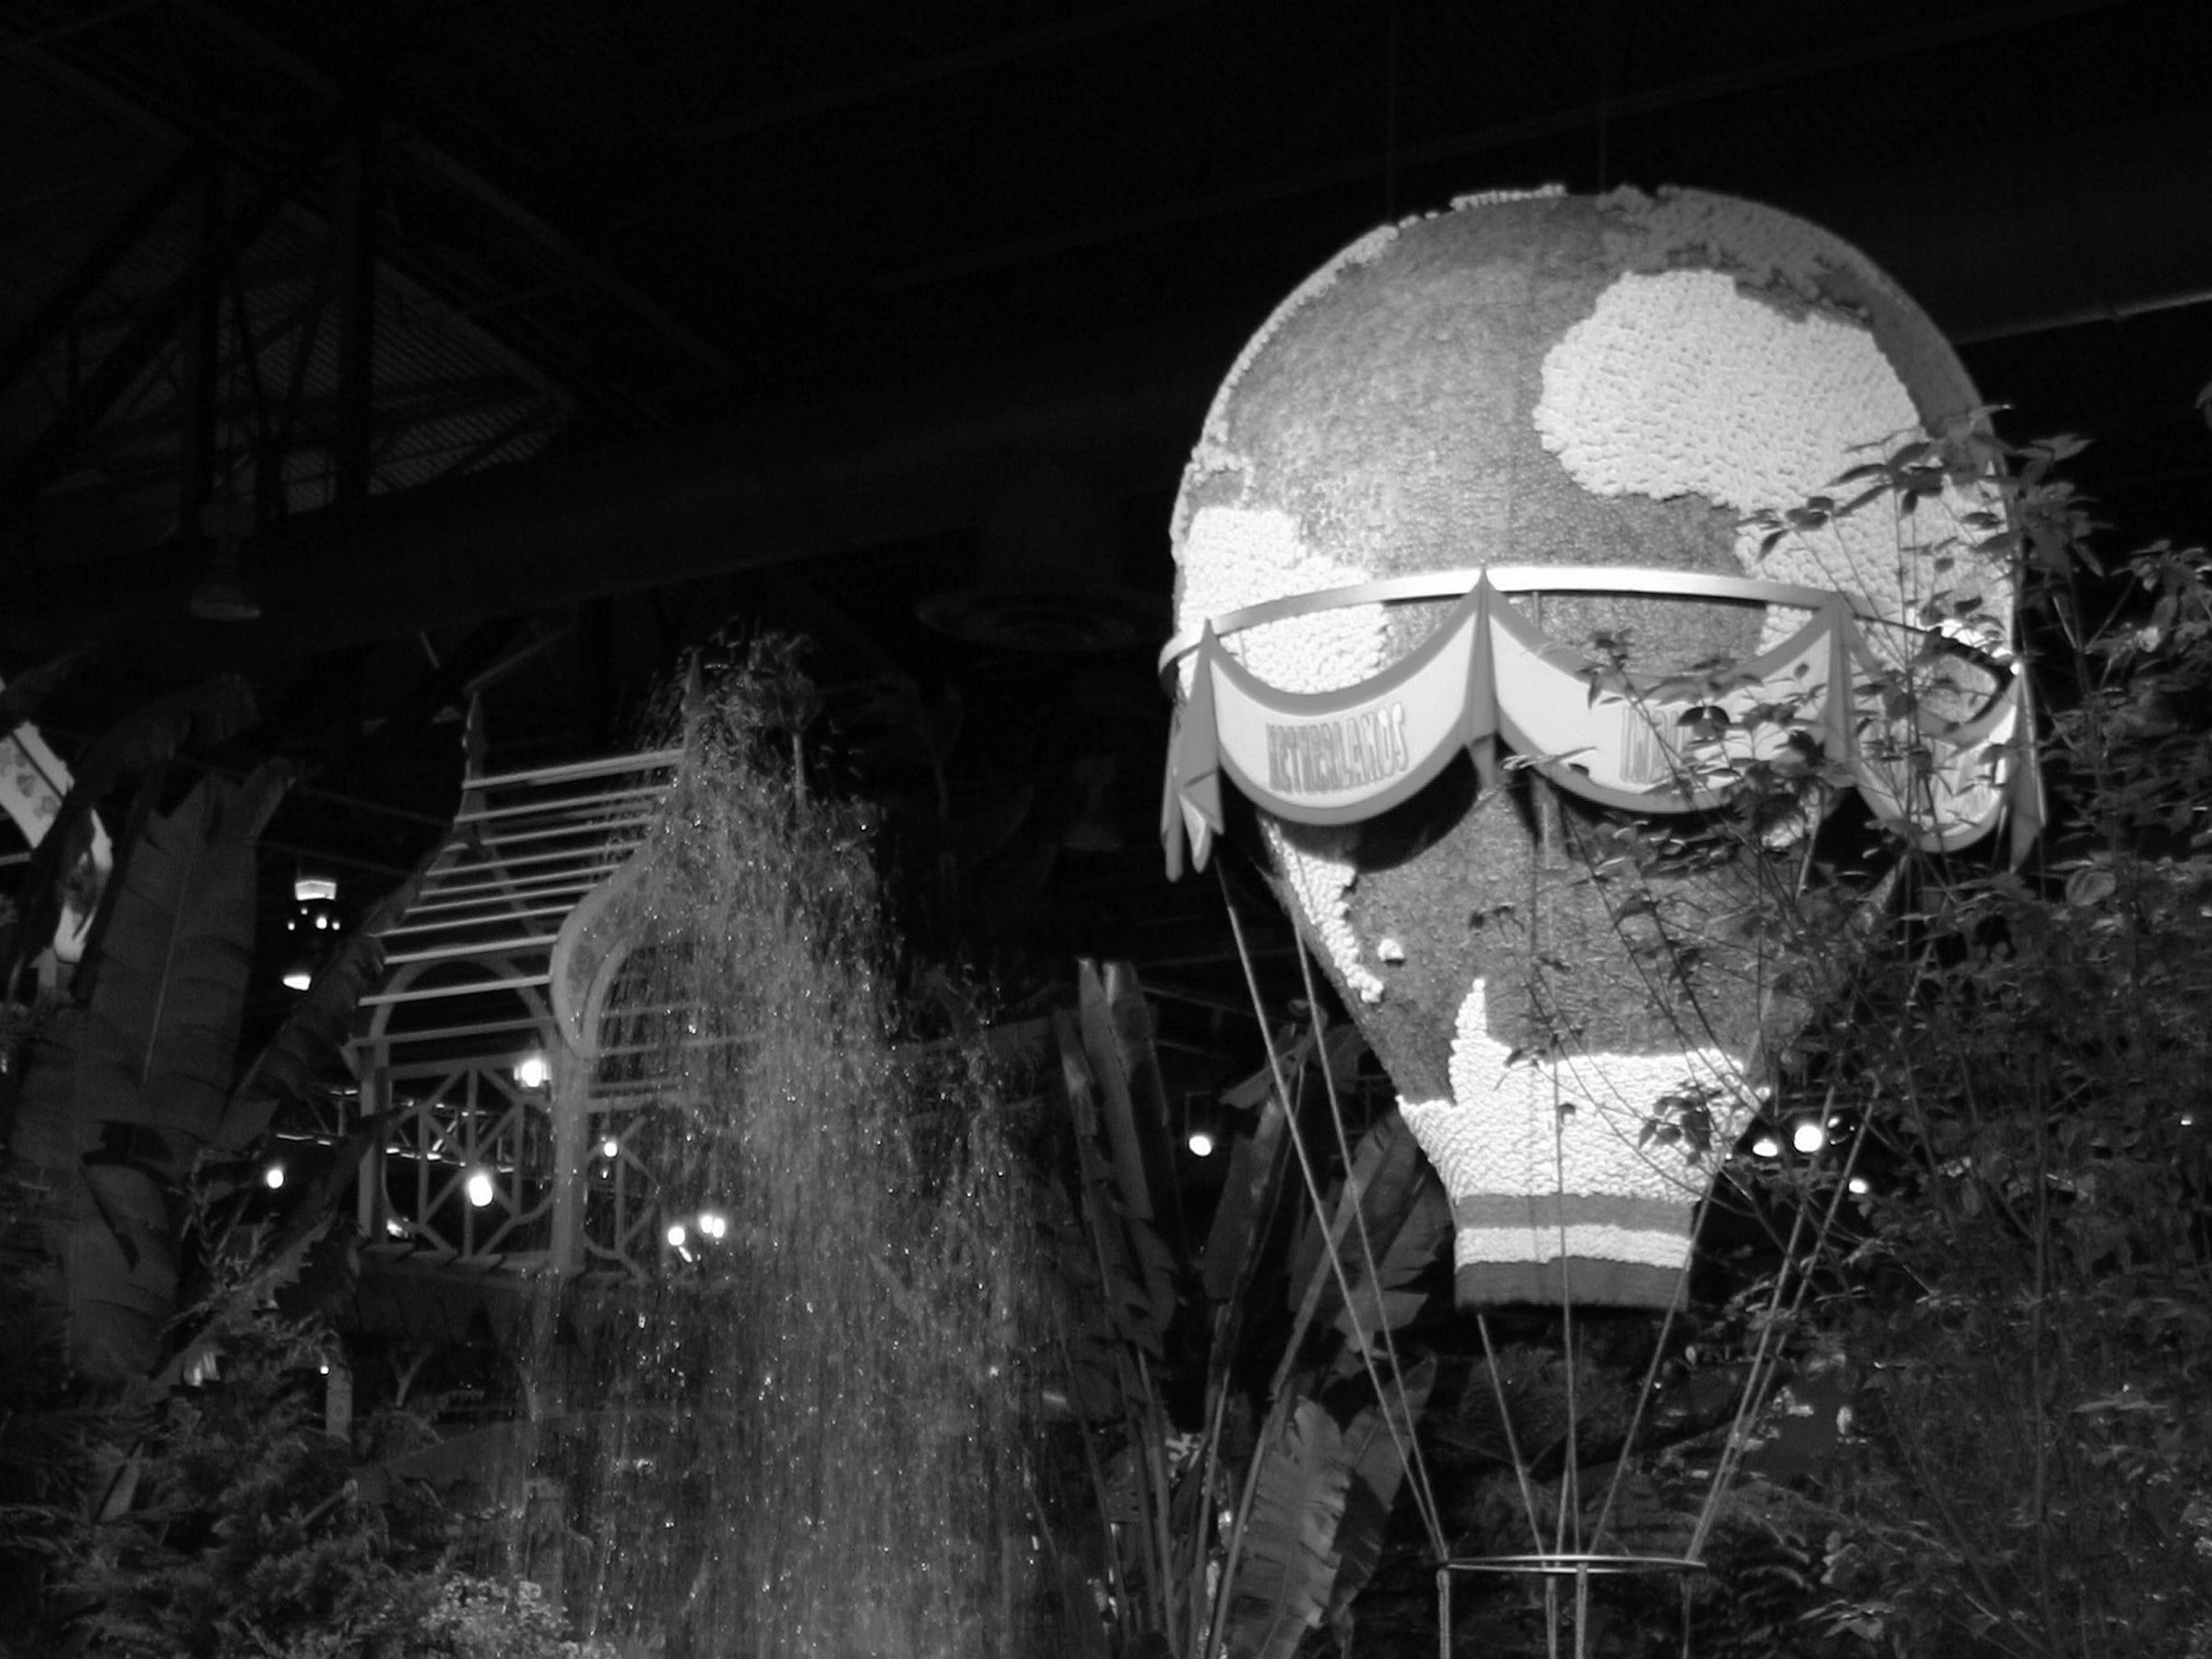 A hot air balloon rises above the 2010 Philadelphia Flower Show.